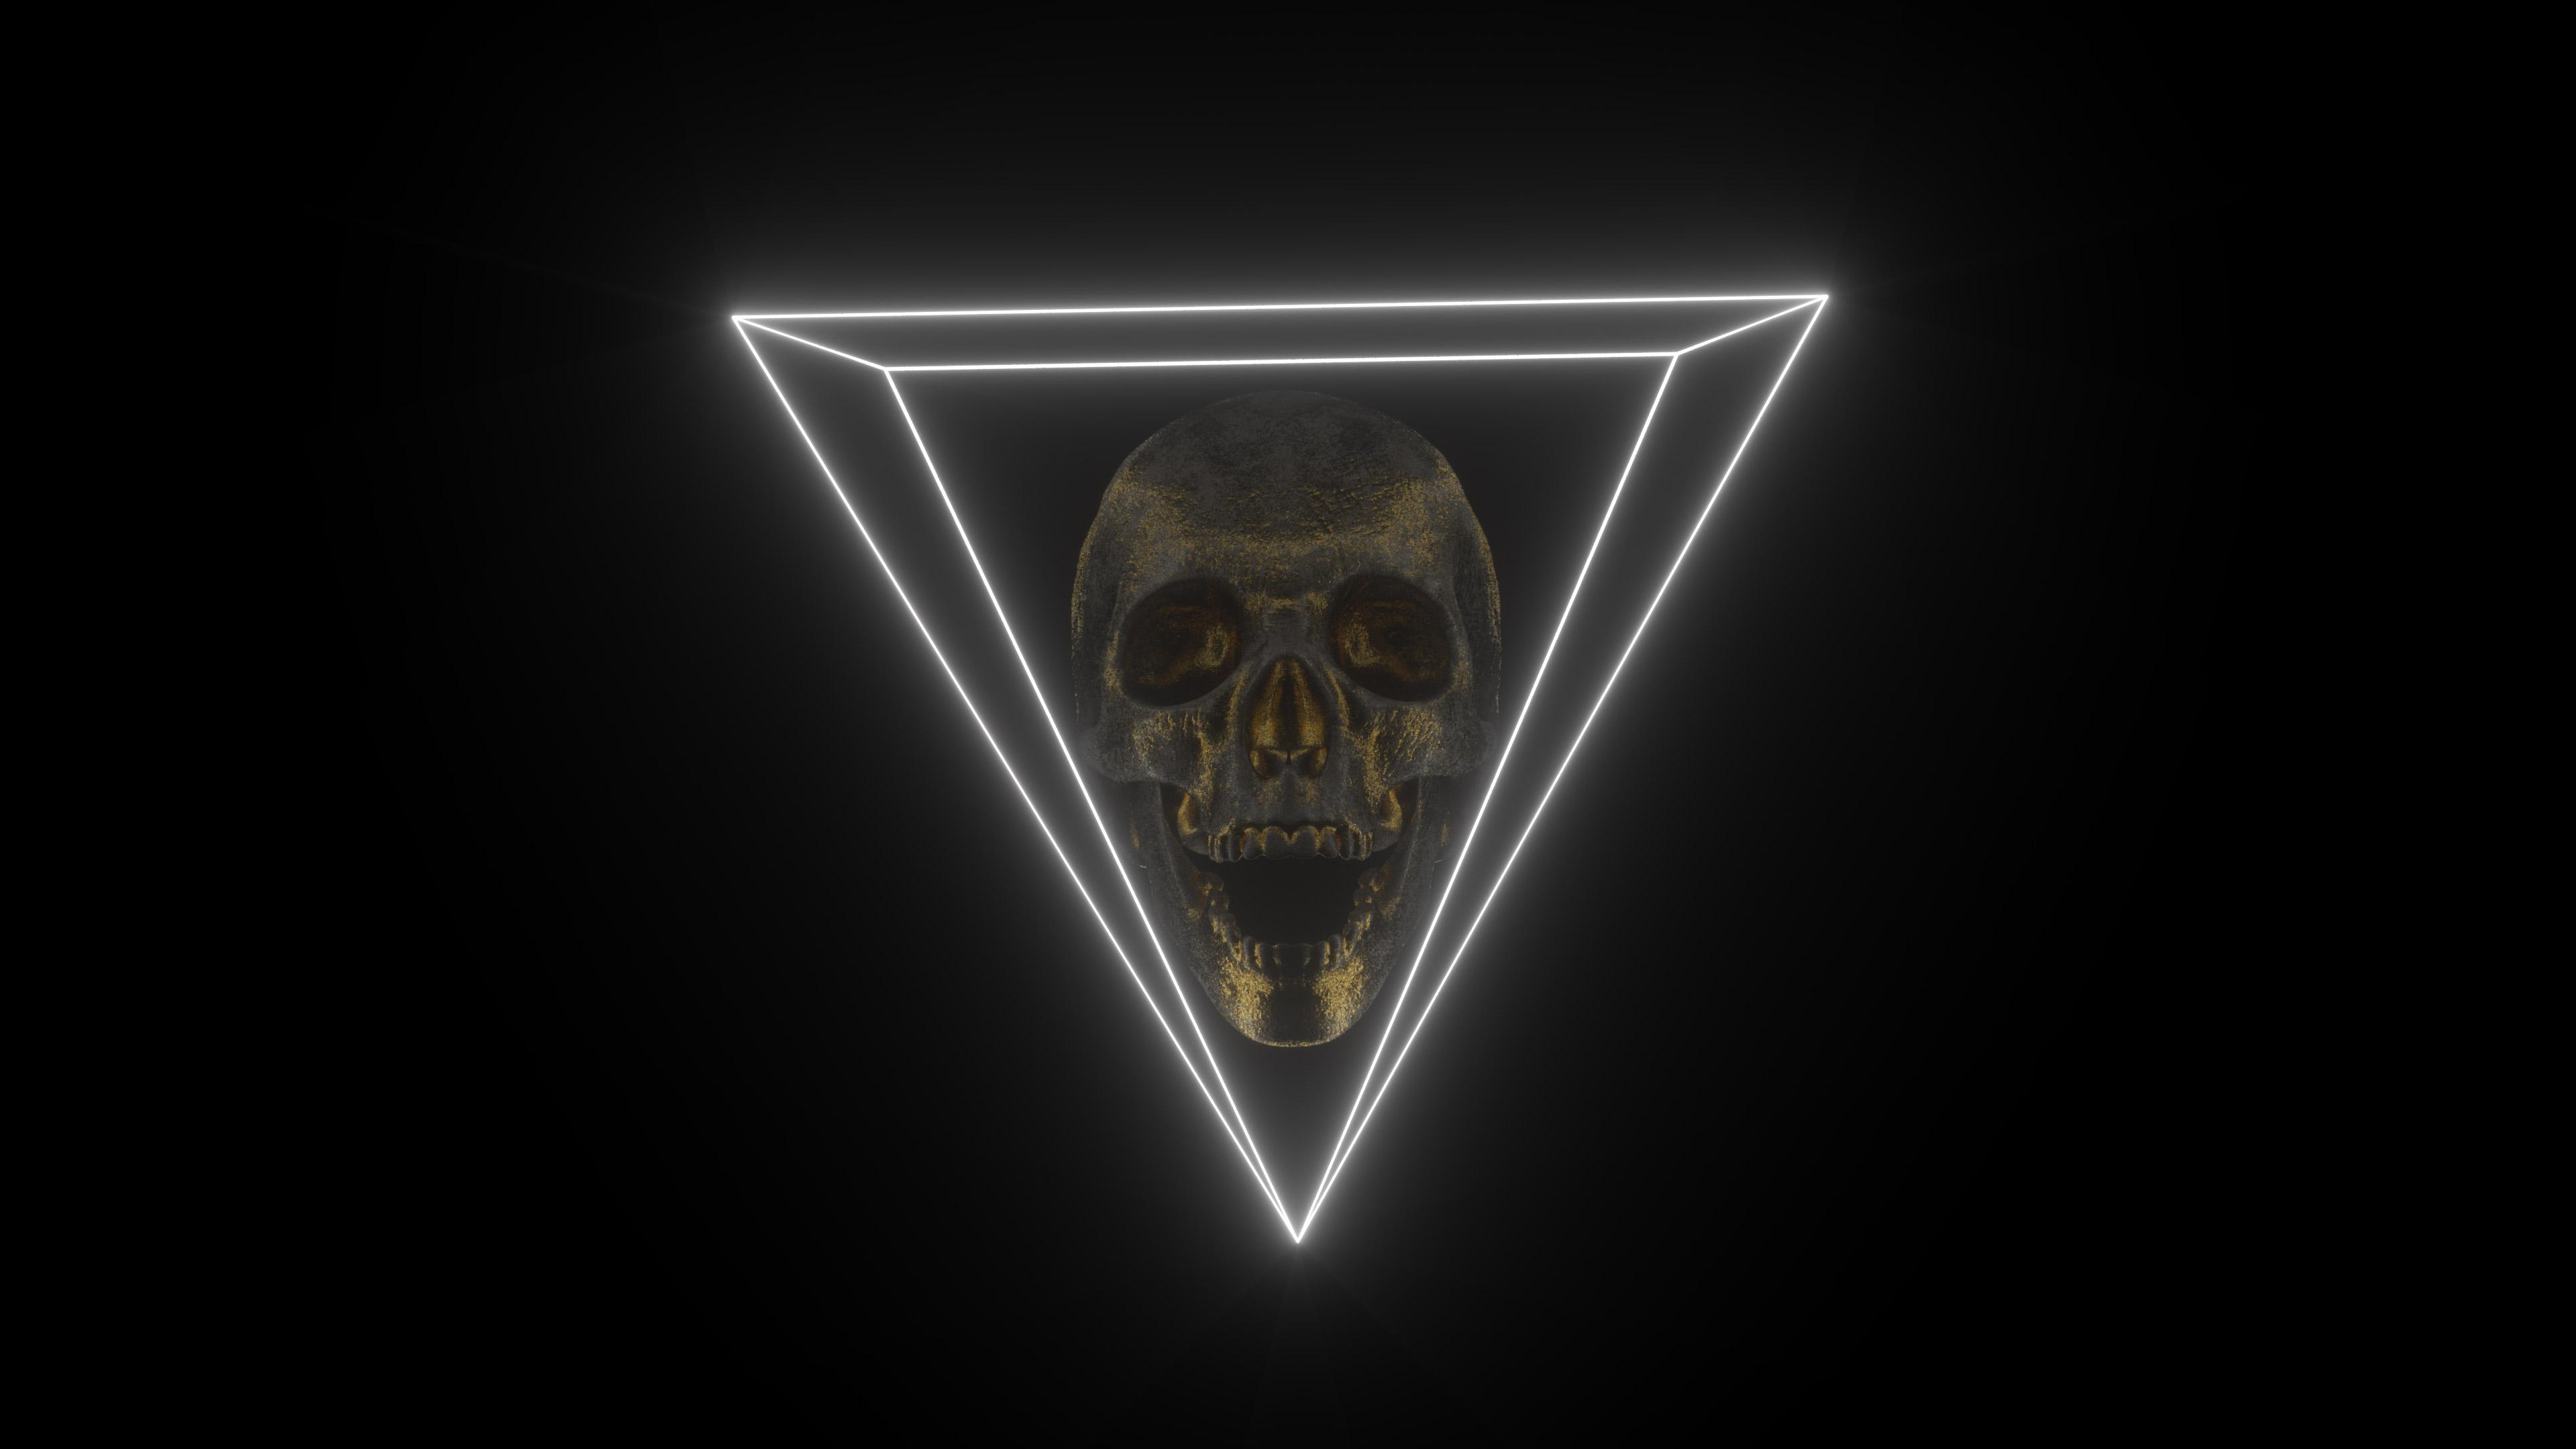 KZ_Afterlife_Pack_20_RamPyramid_v20191007_0068